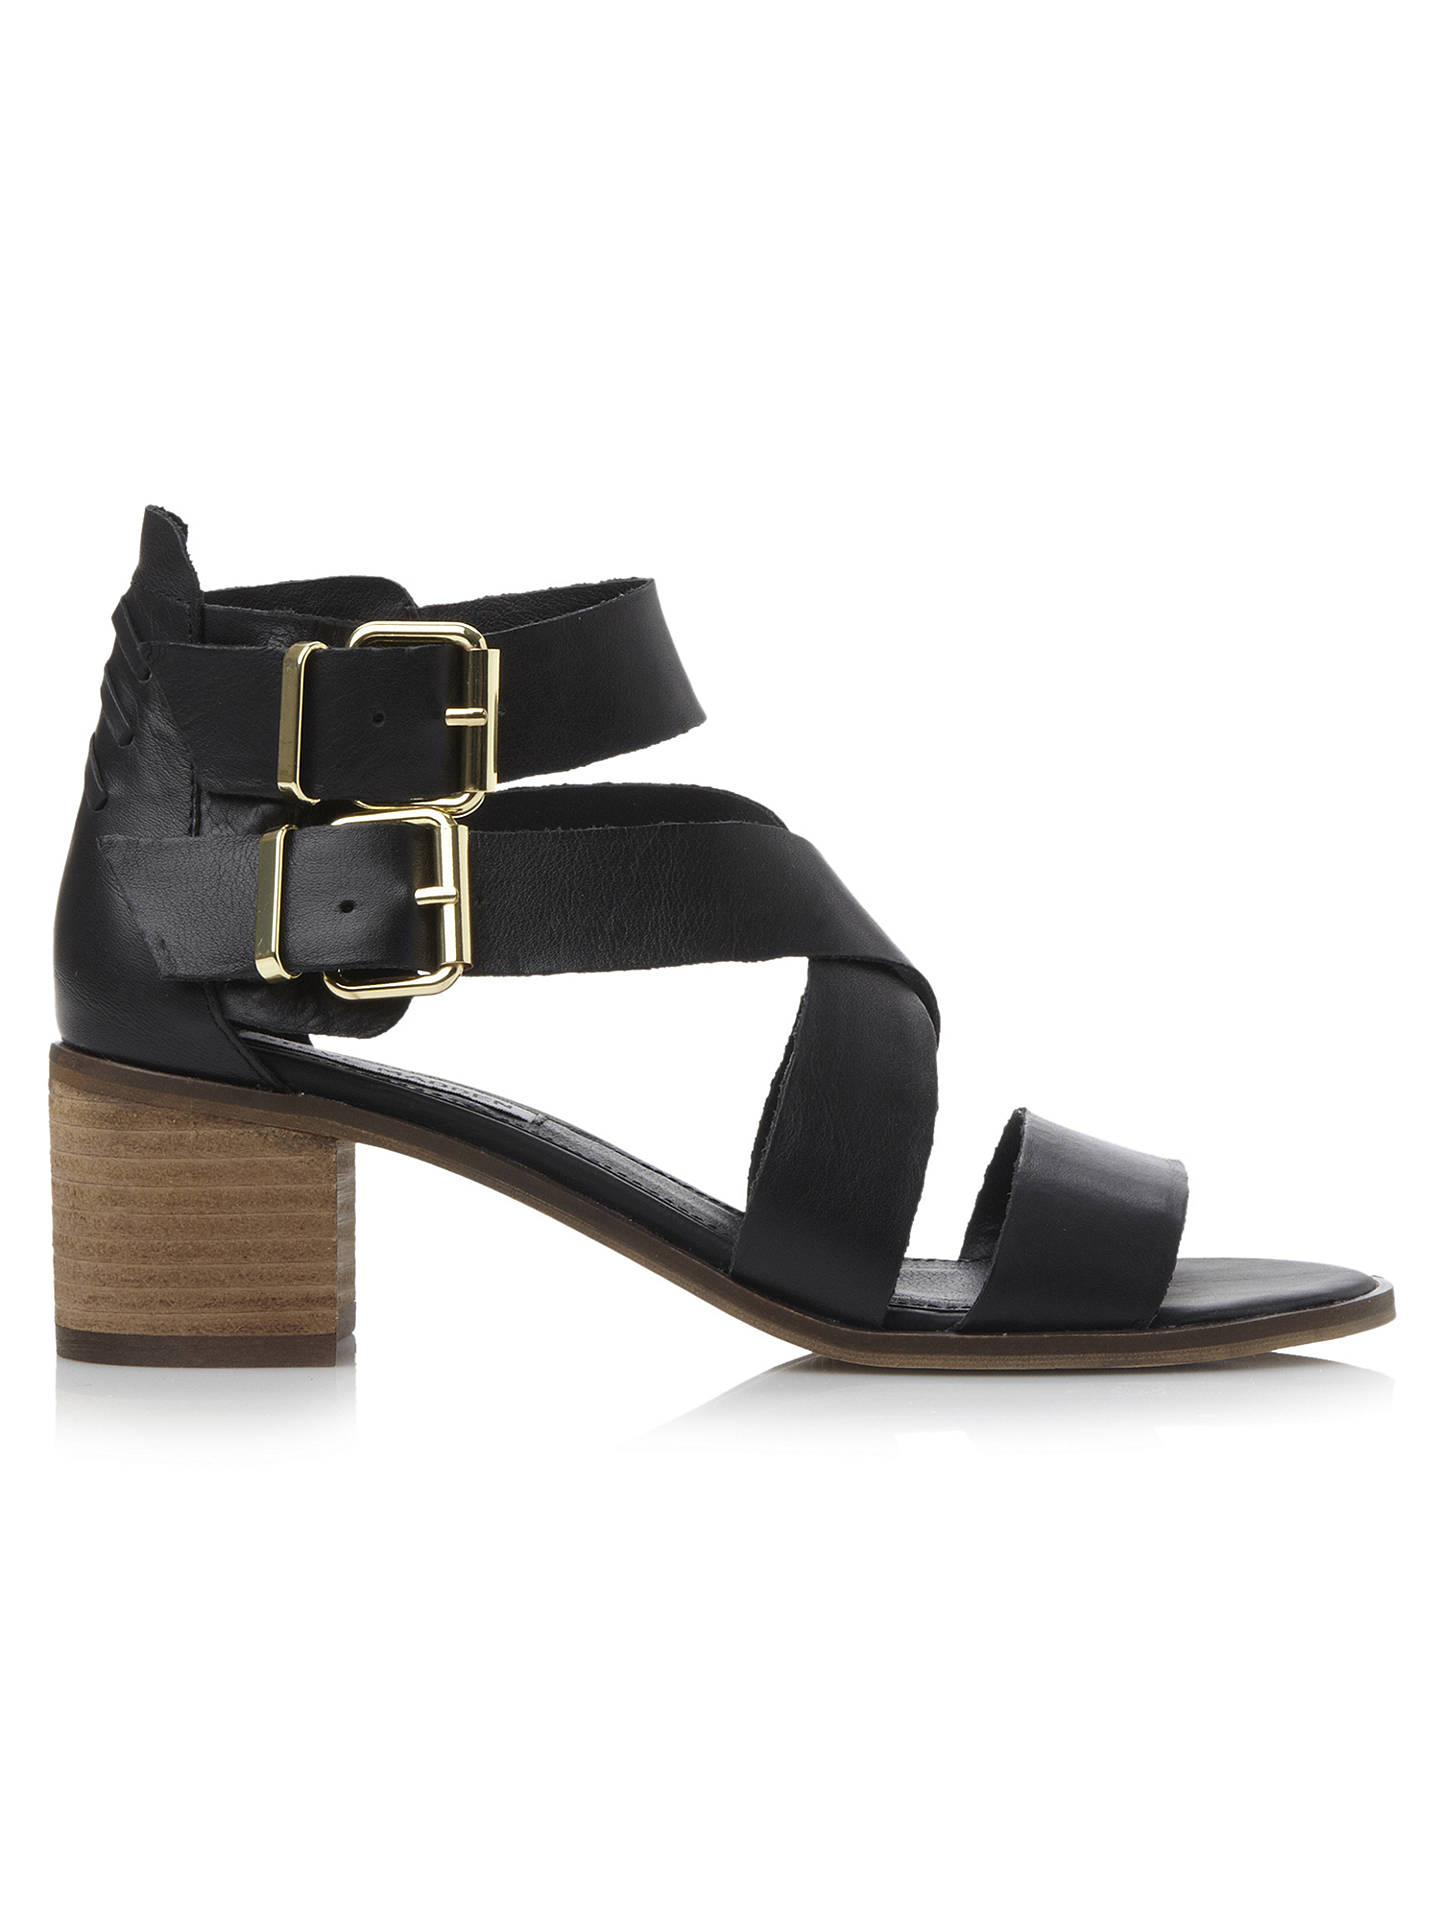 d1a19c4ab66 Steve Madden Rosana Strappy Leather Block Heel Sandals at John Lewis ...